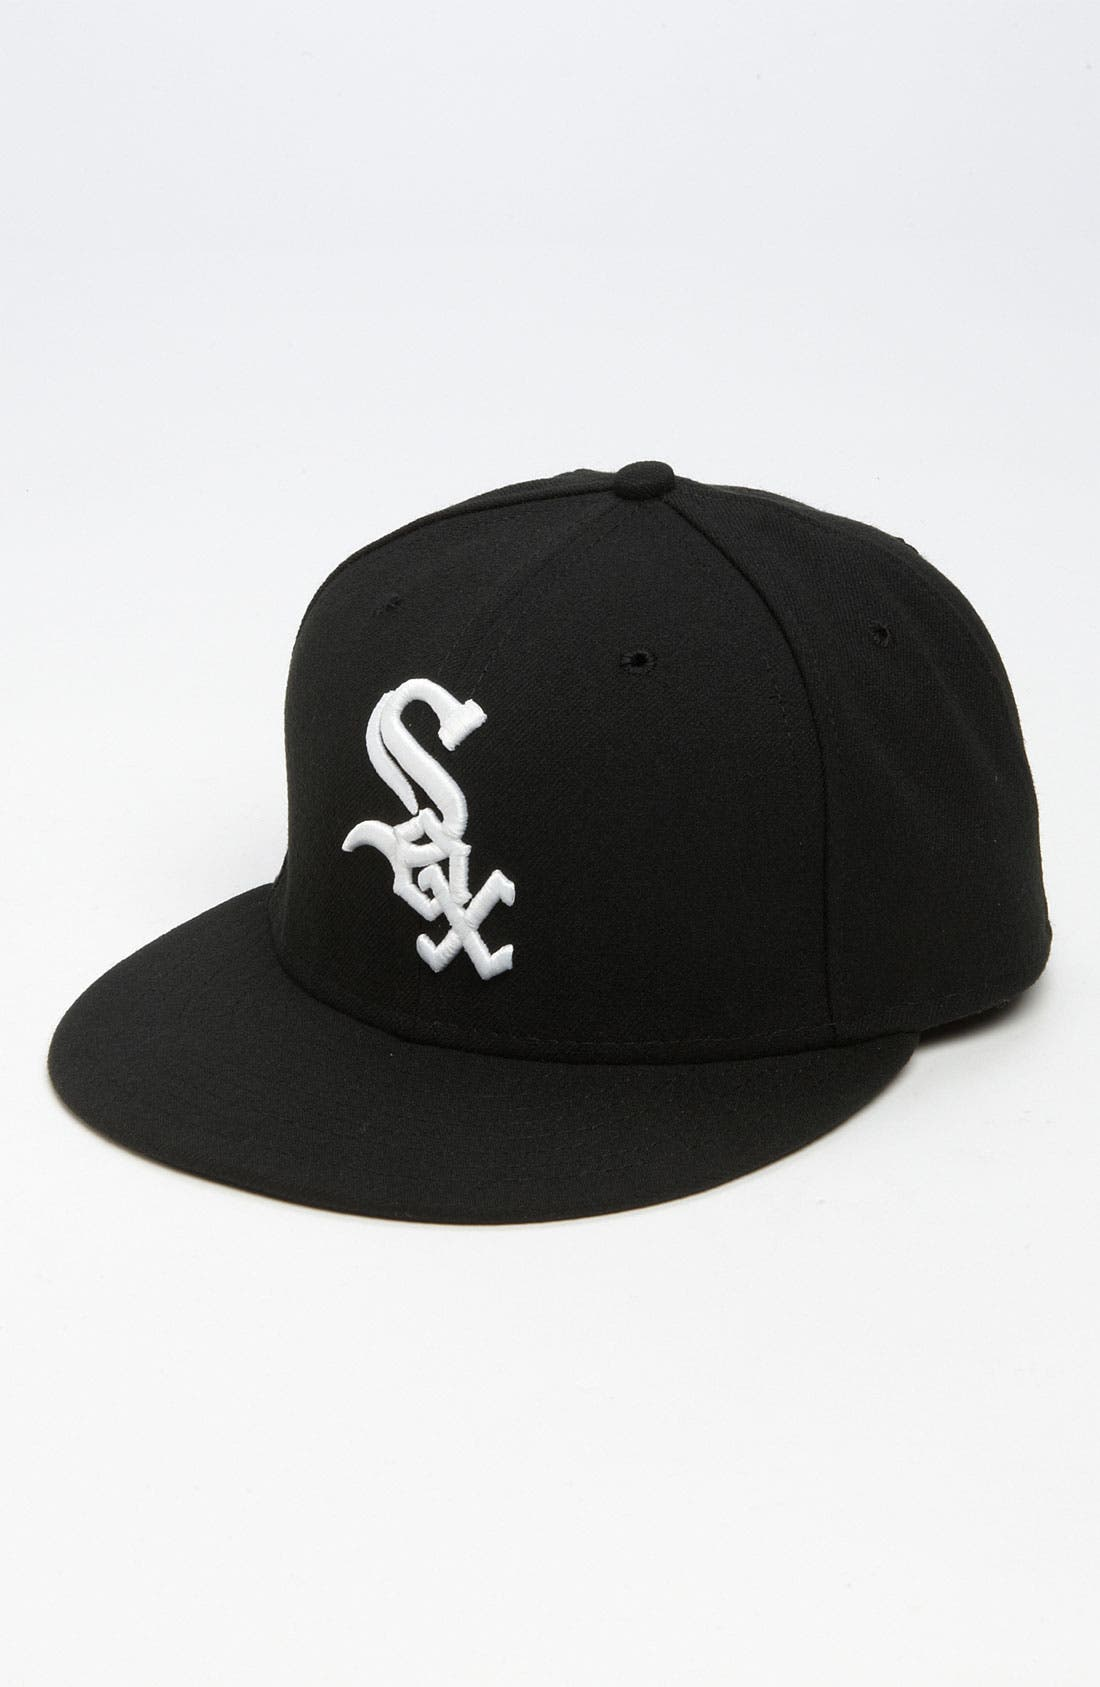 Alternate Image 1 Selected - New Era Cap 'Chicago White Sox' Baseball Cap